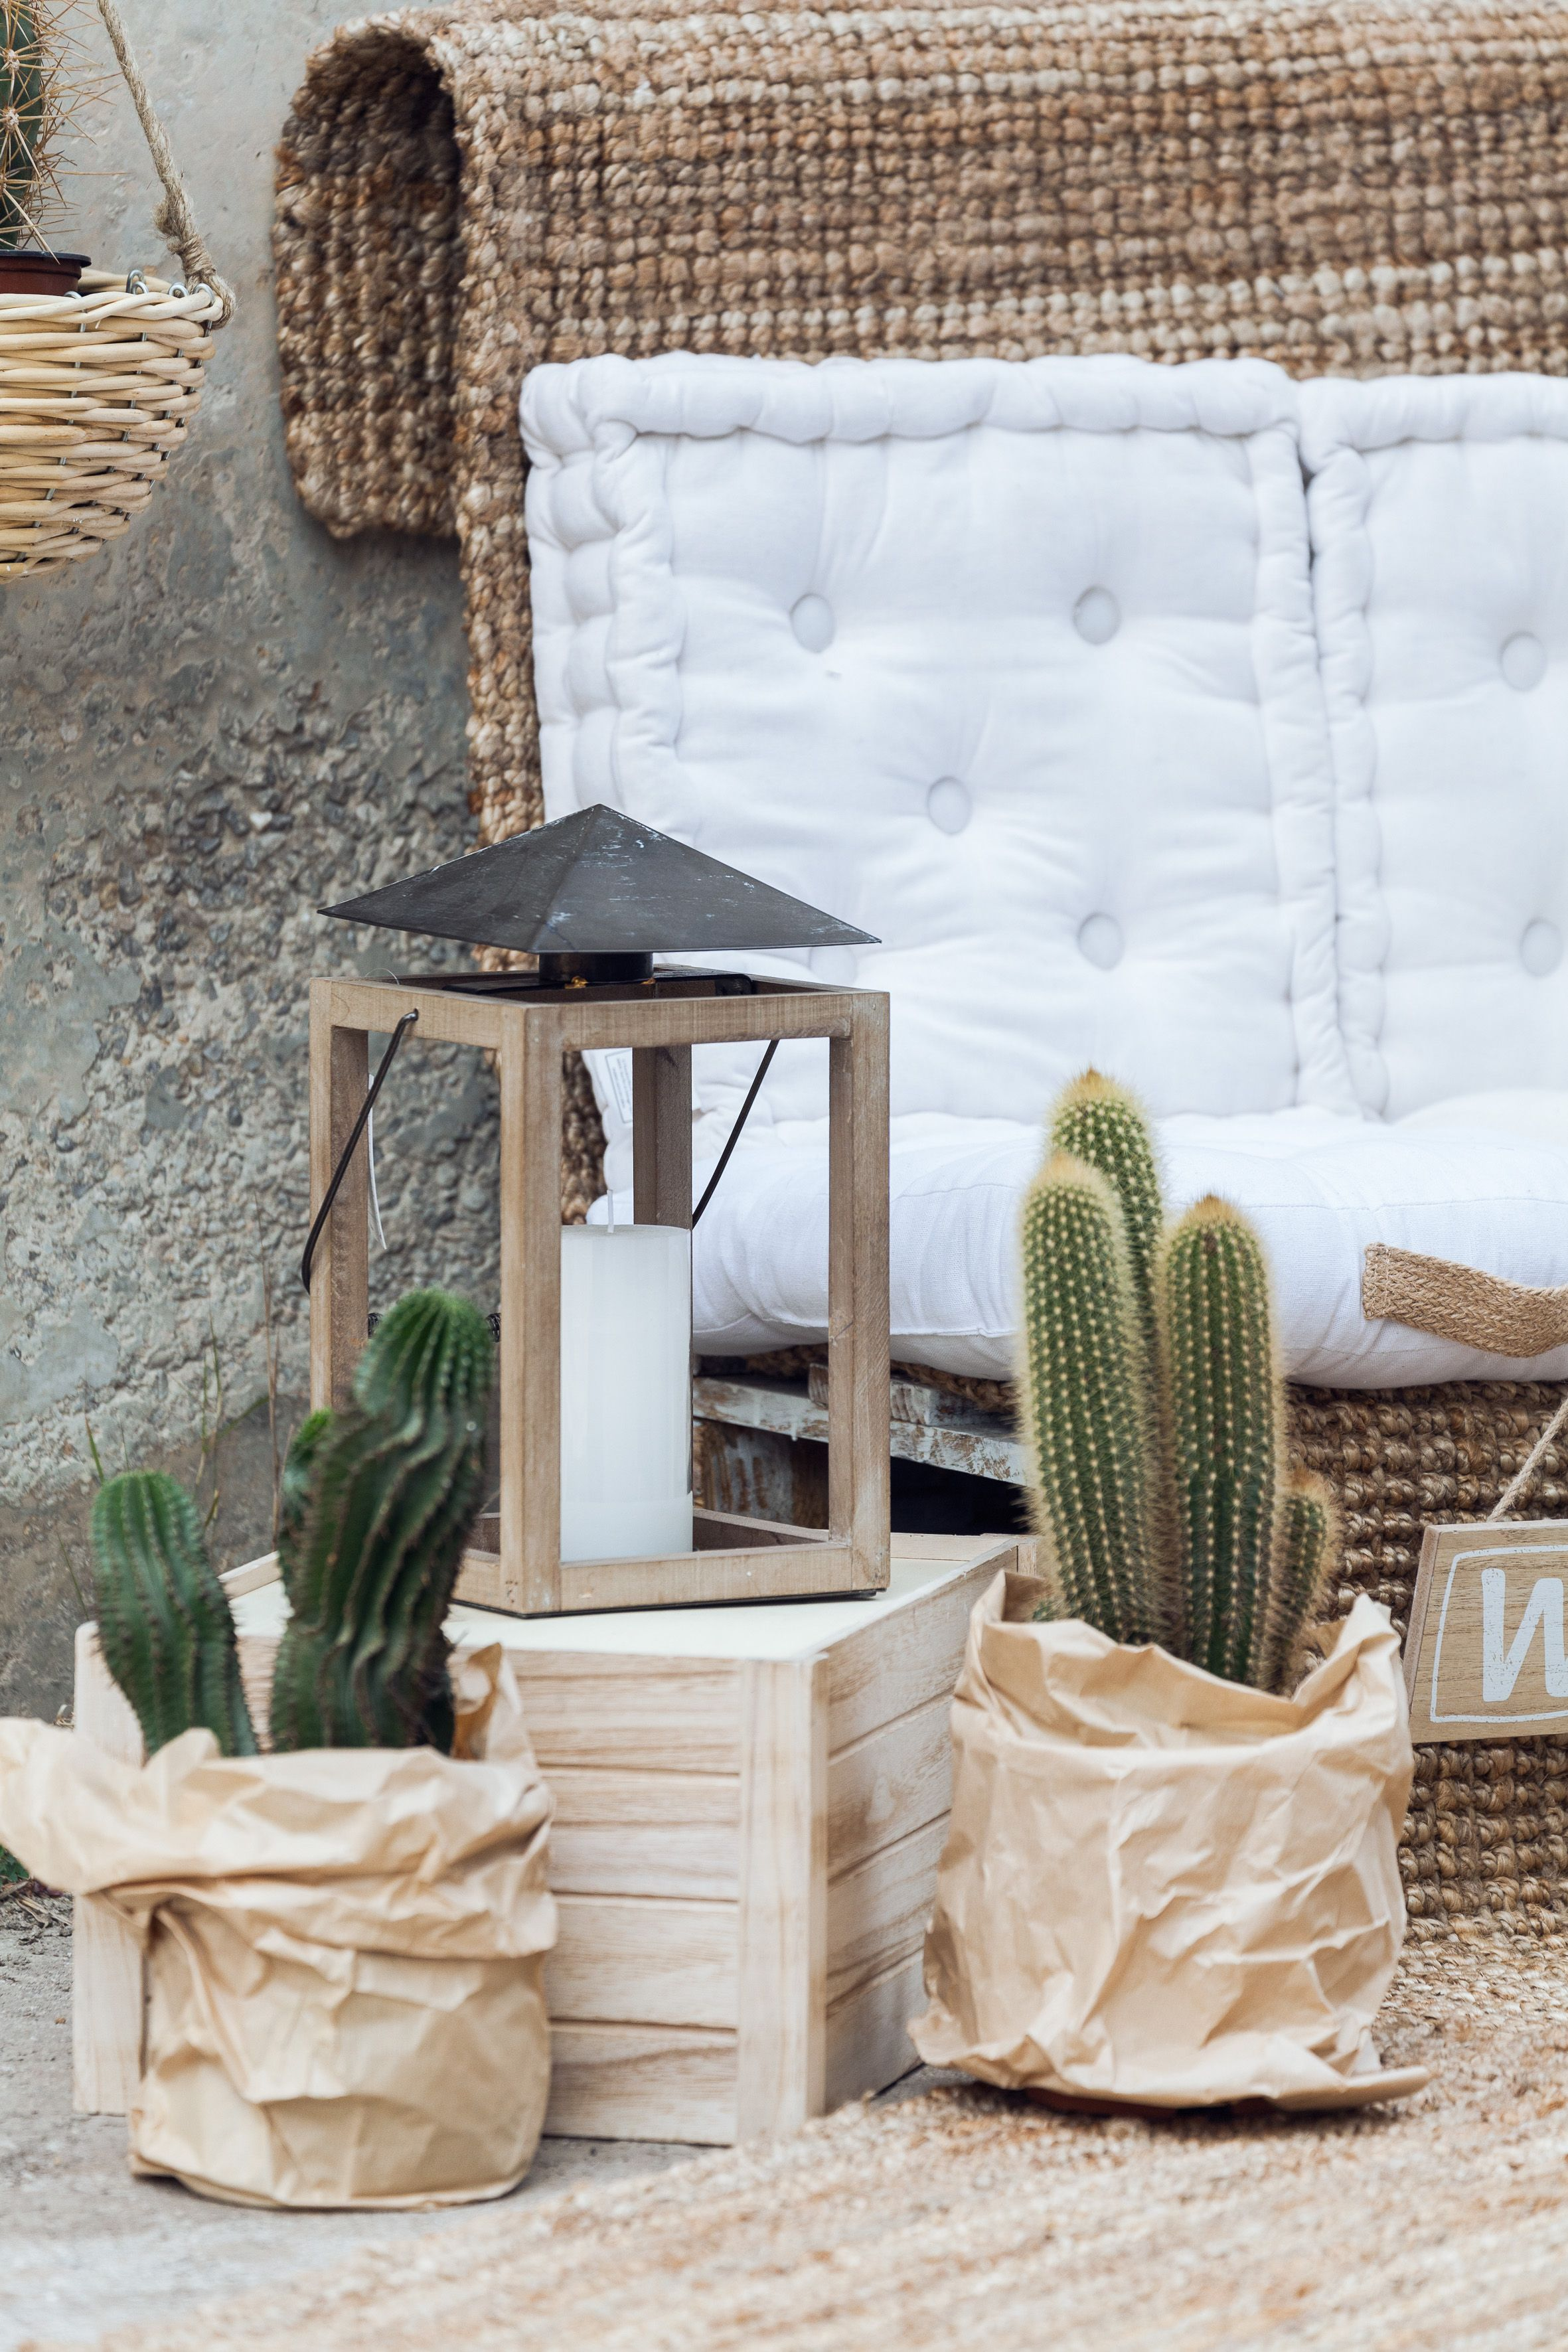 detalles naturales para decorar interiores o exteriores todo de muy mucho muymucho